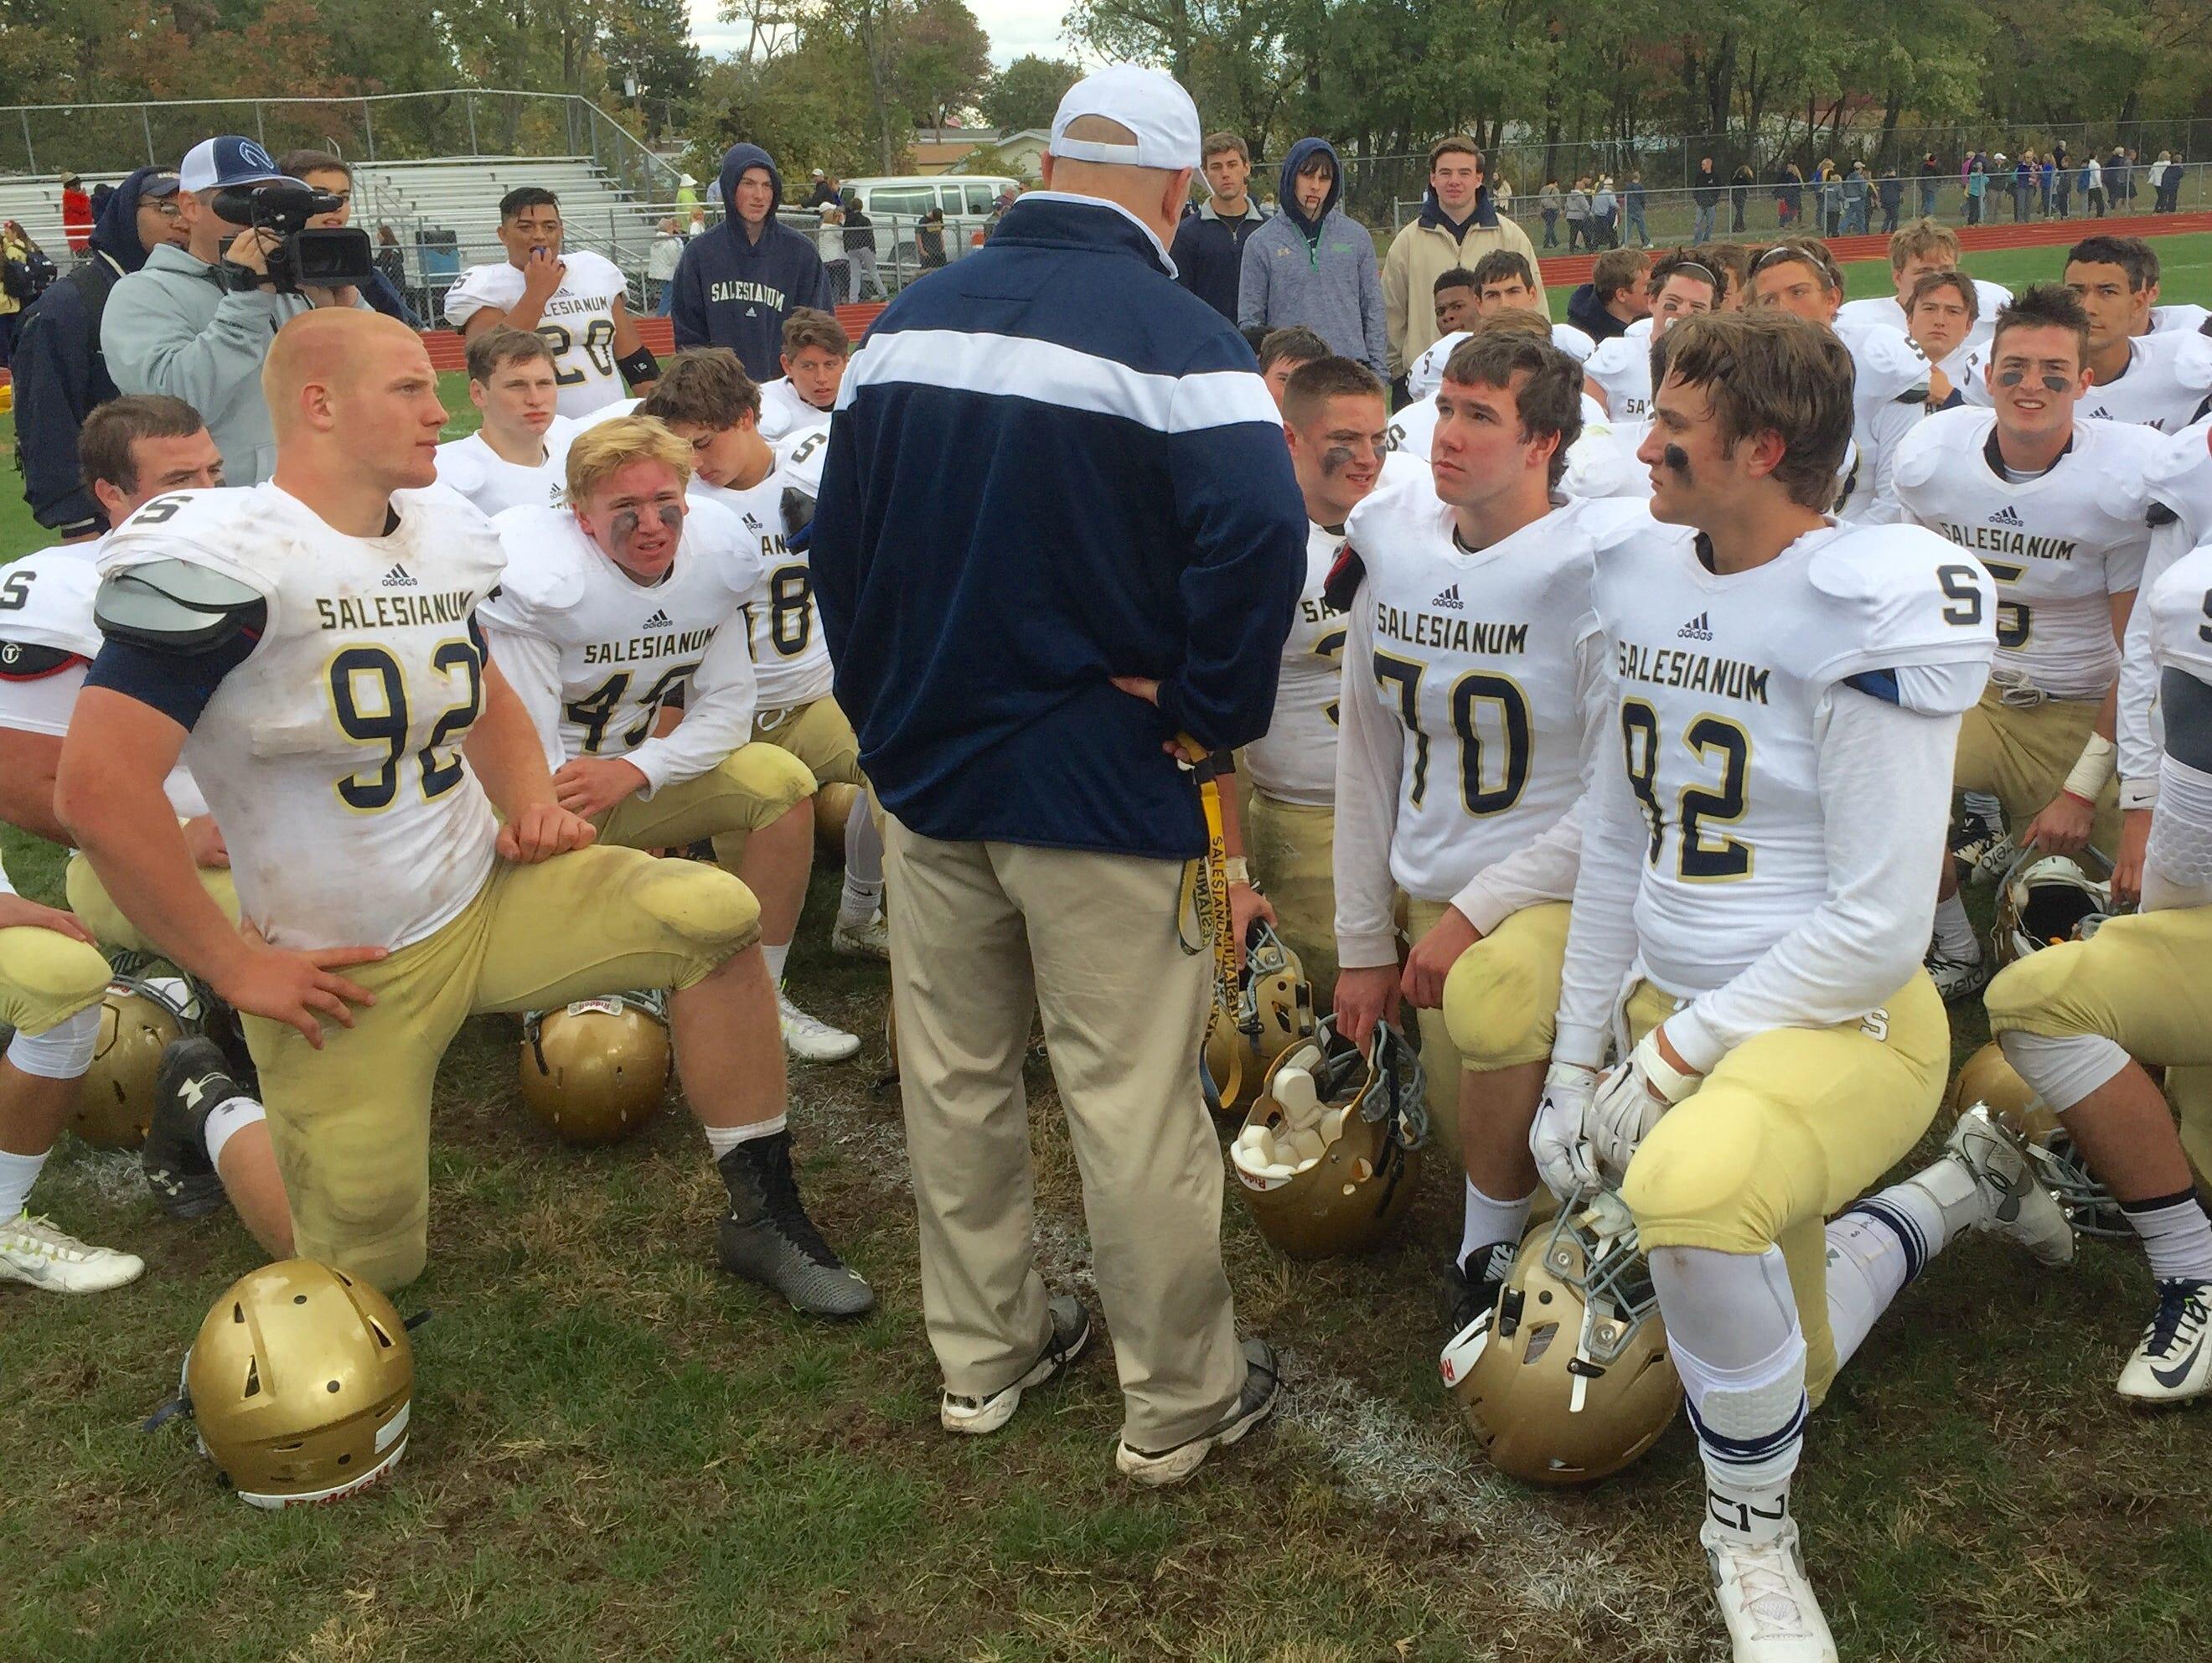 Salesianum coach Bill DiNardo addresses his team after a 34-8 win at Concord on Saturday.